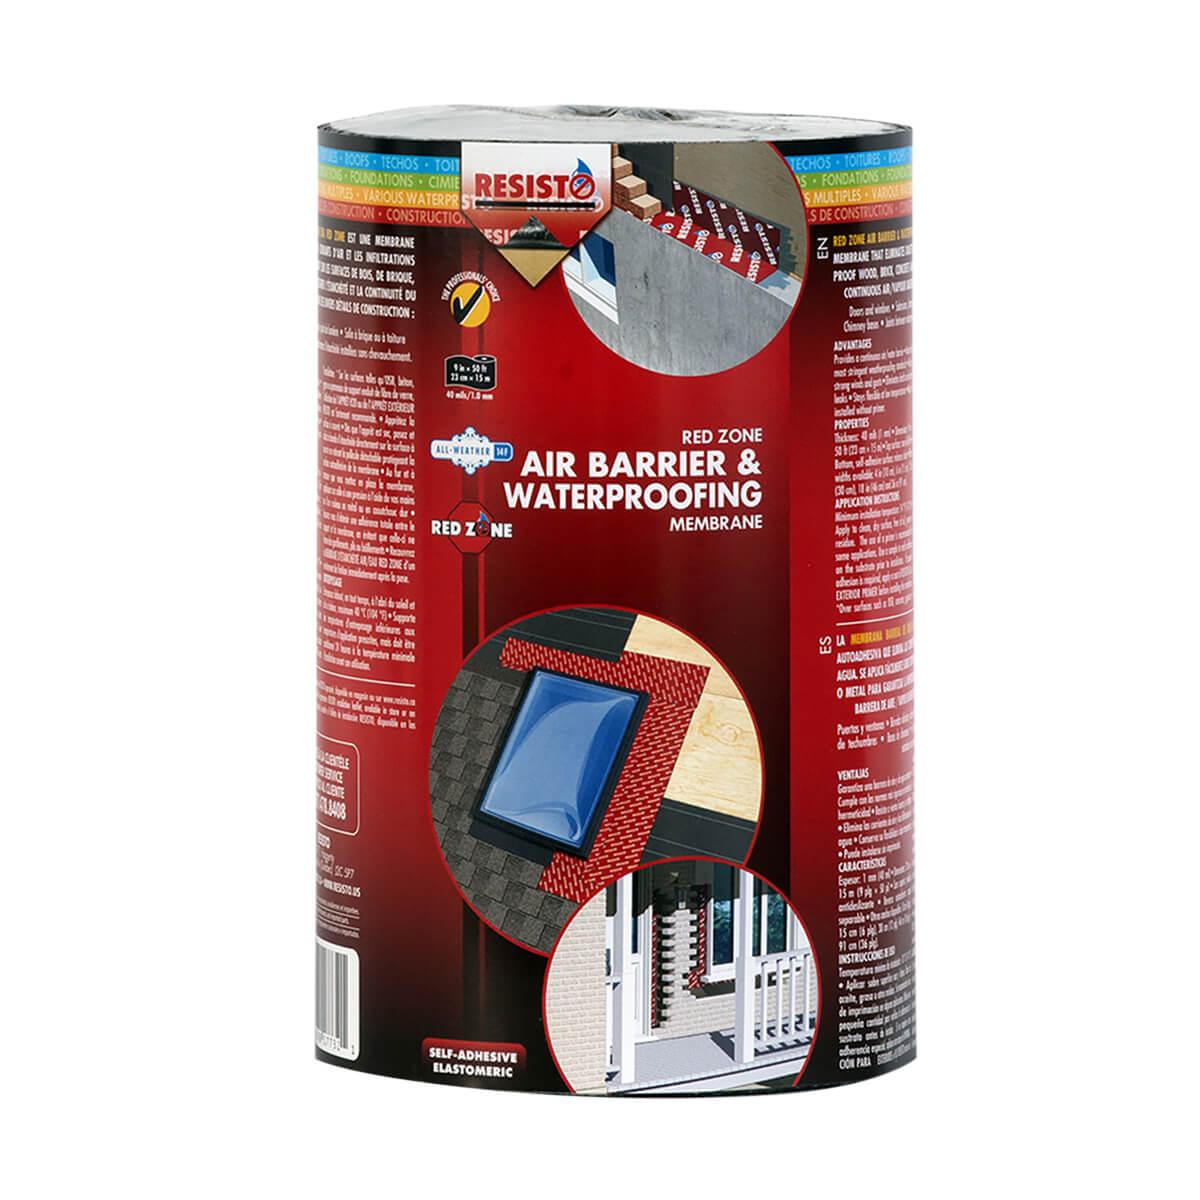 "Redzone Air Barrier & Waterproofing Membrane - 9"" x 50'"